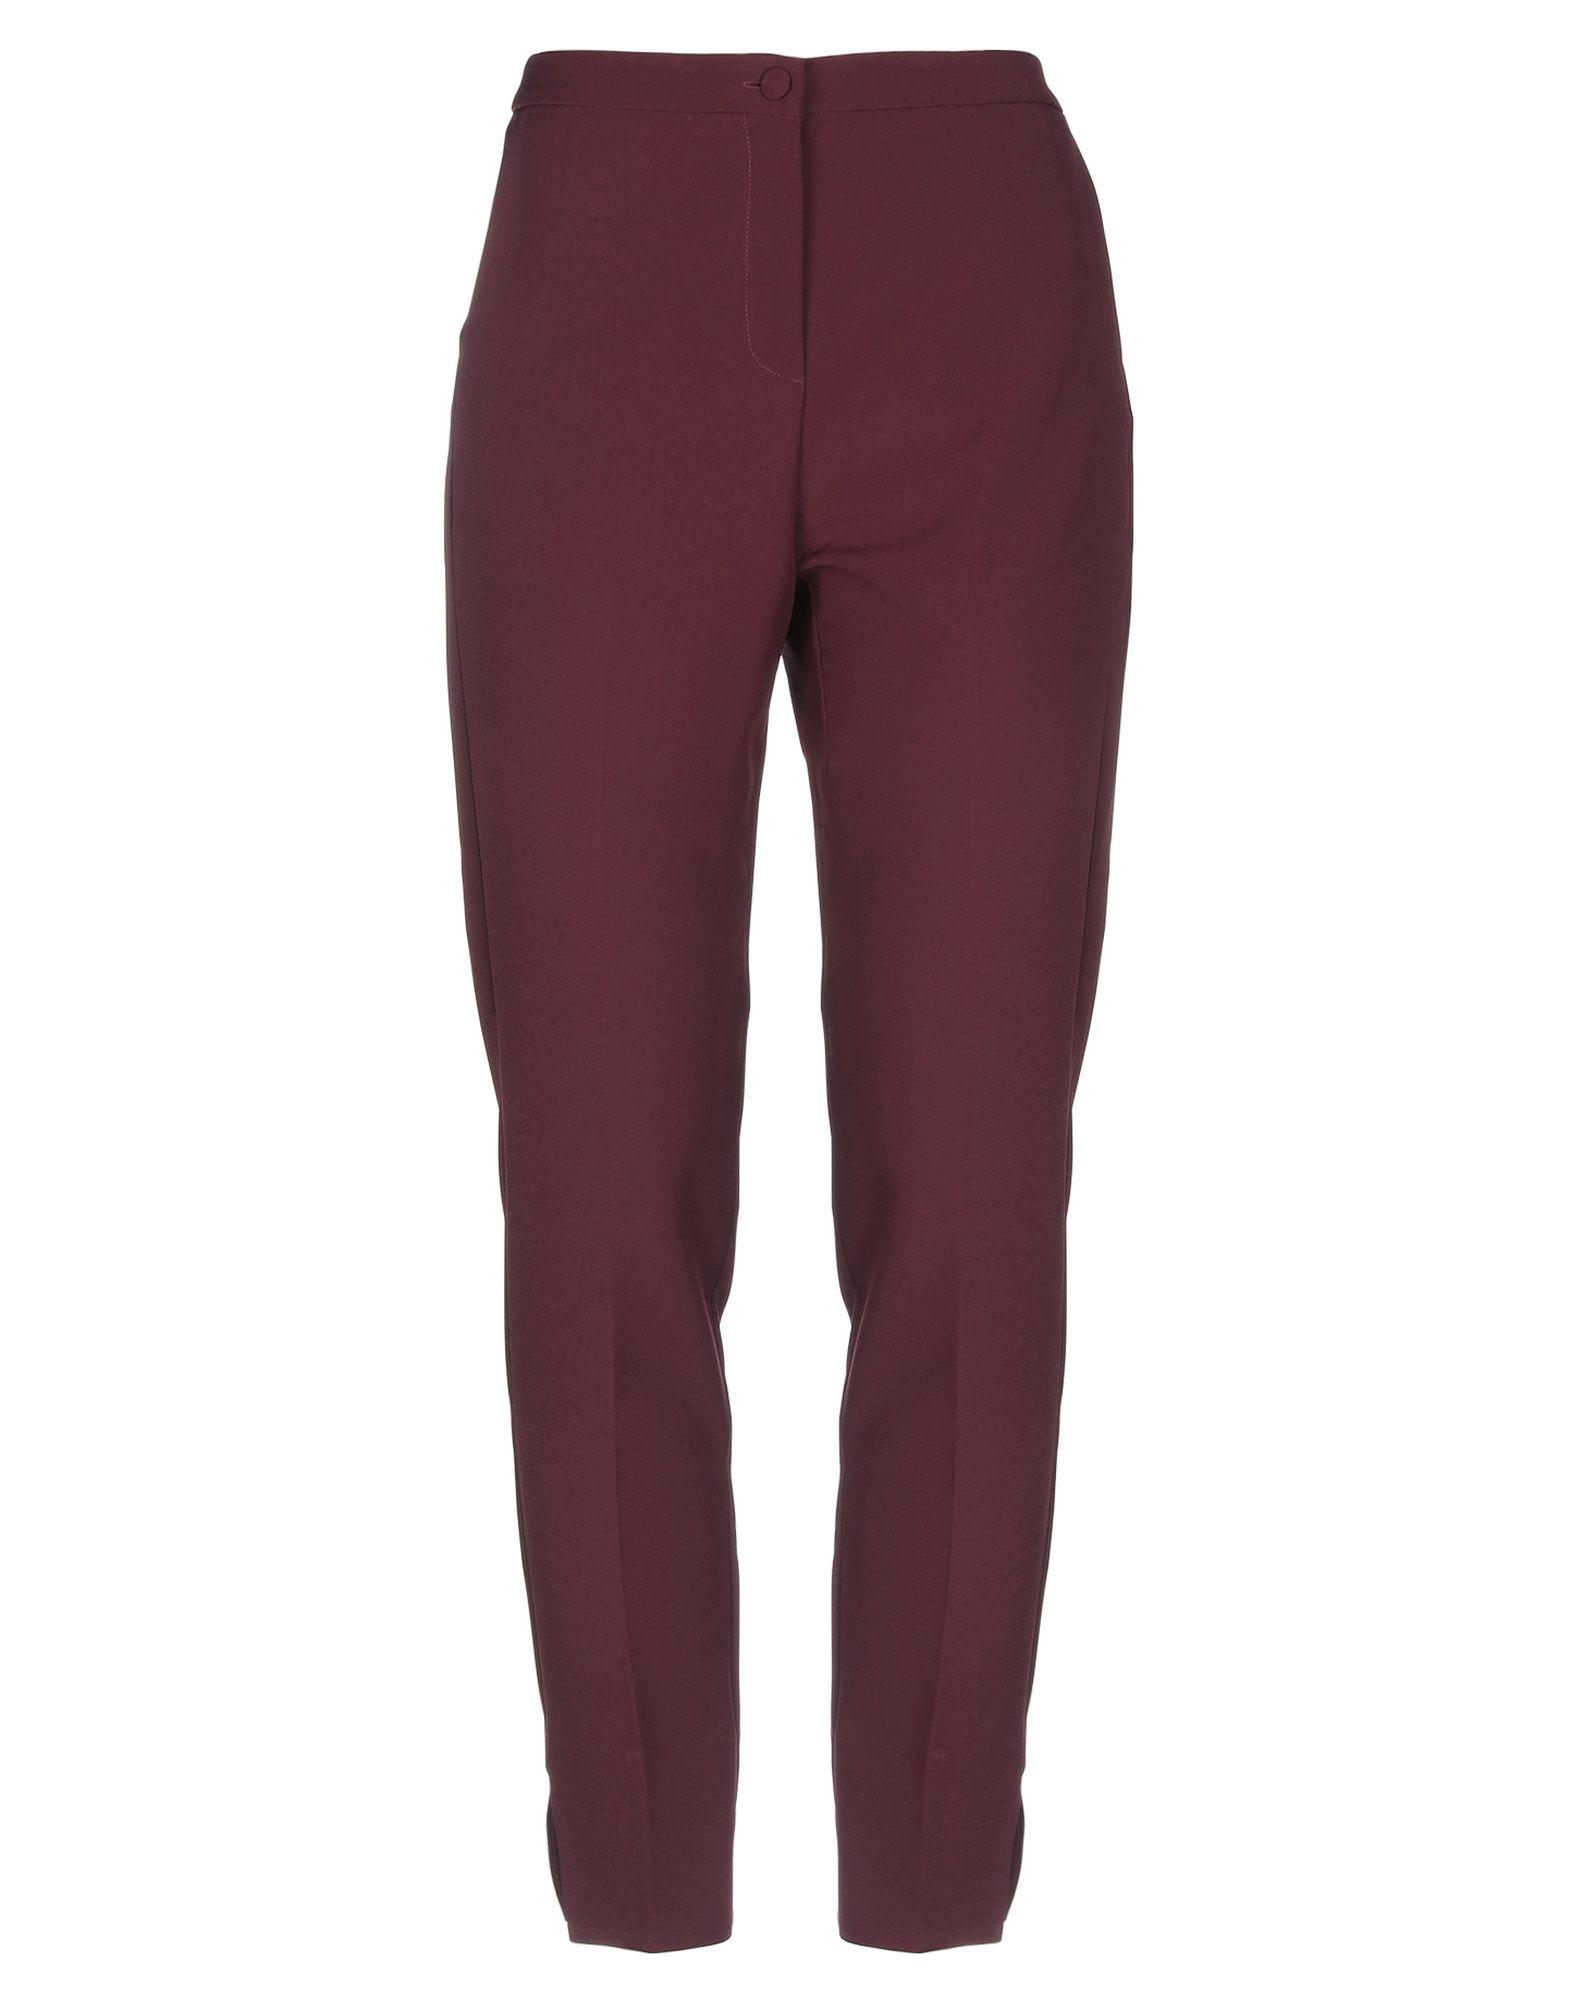 Pantalone blumarine donna donna donna - 13347650BG 101